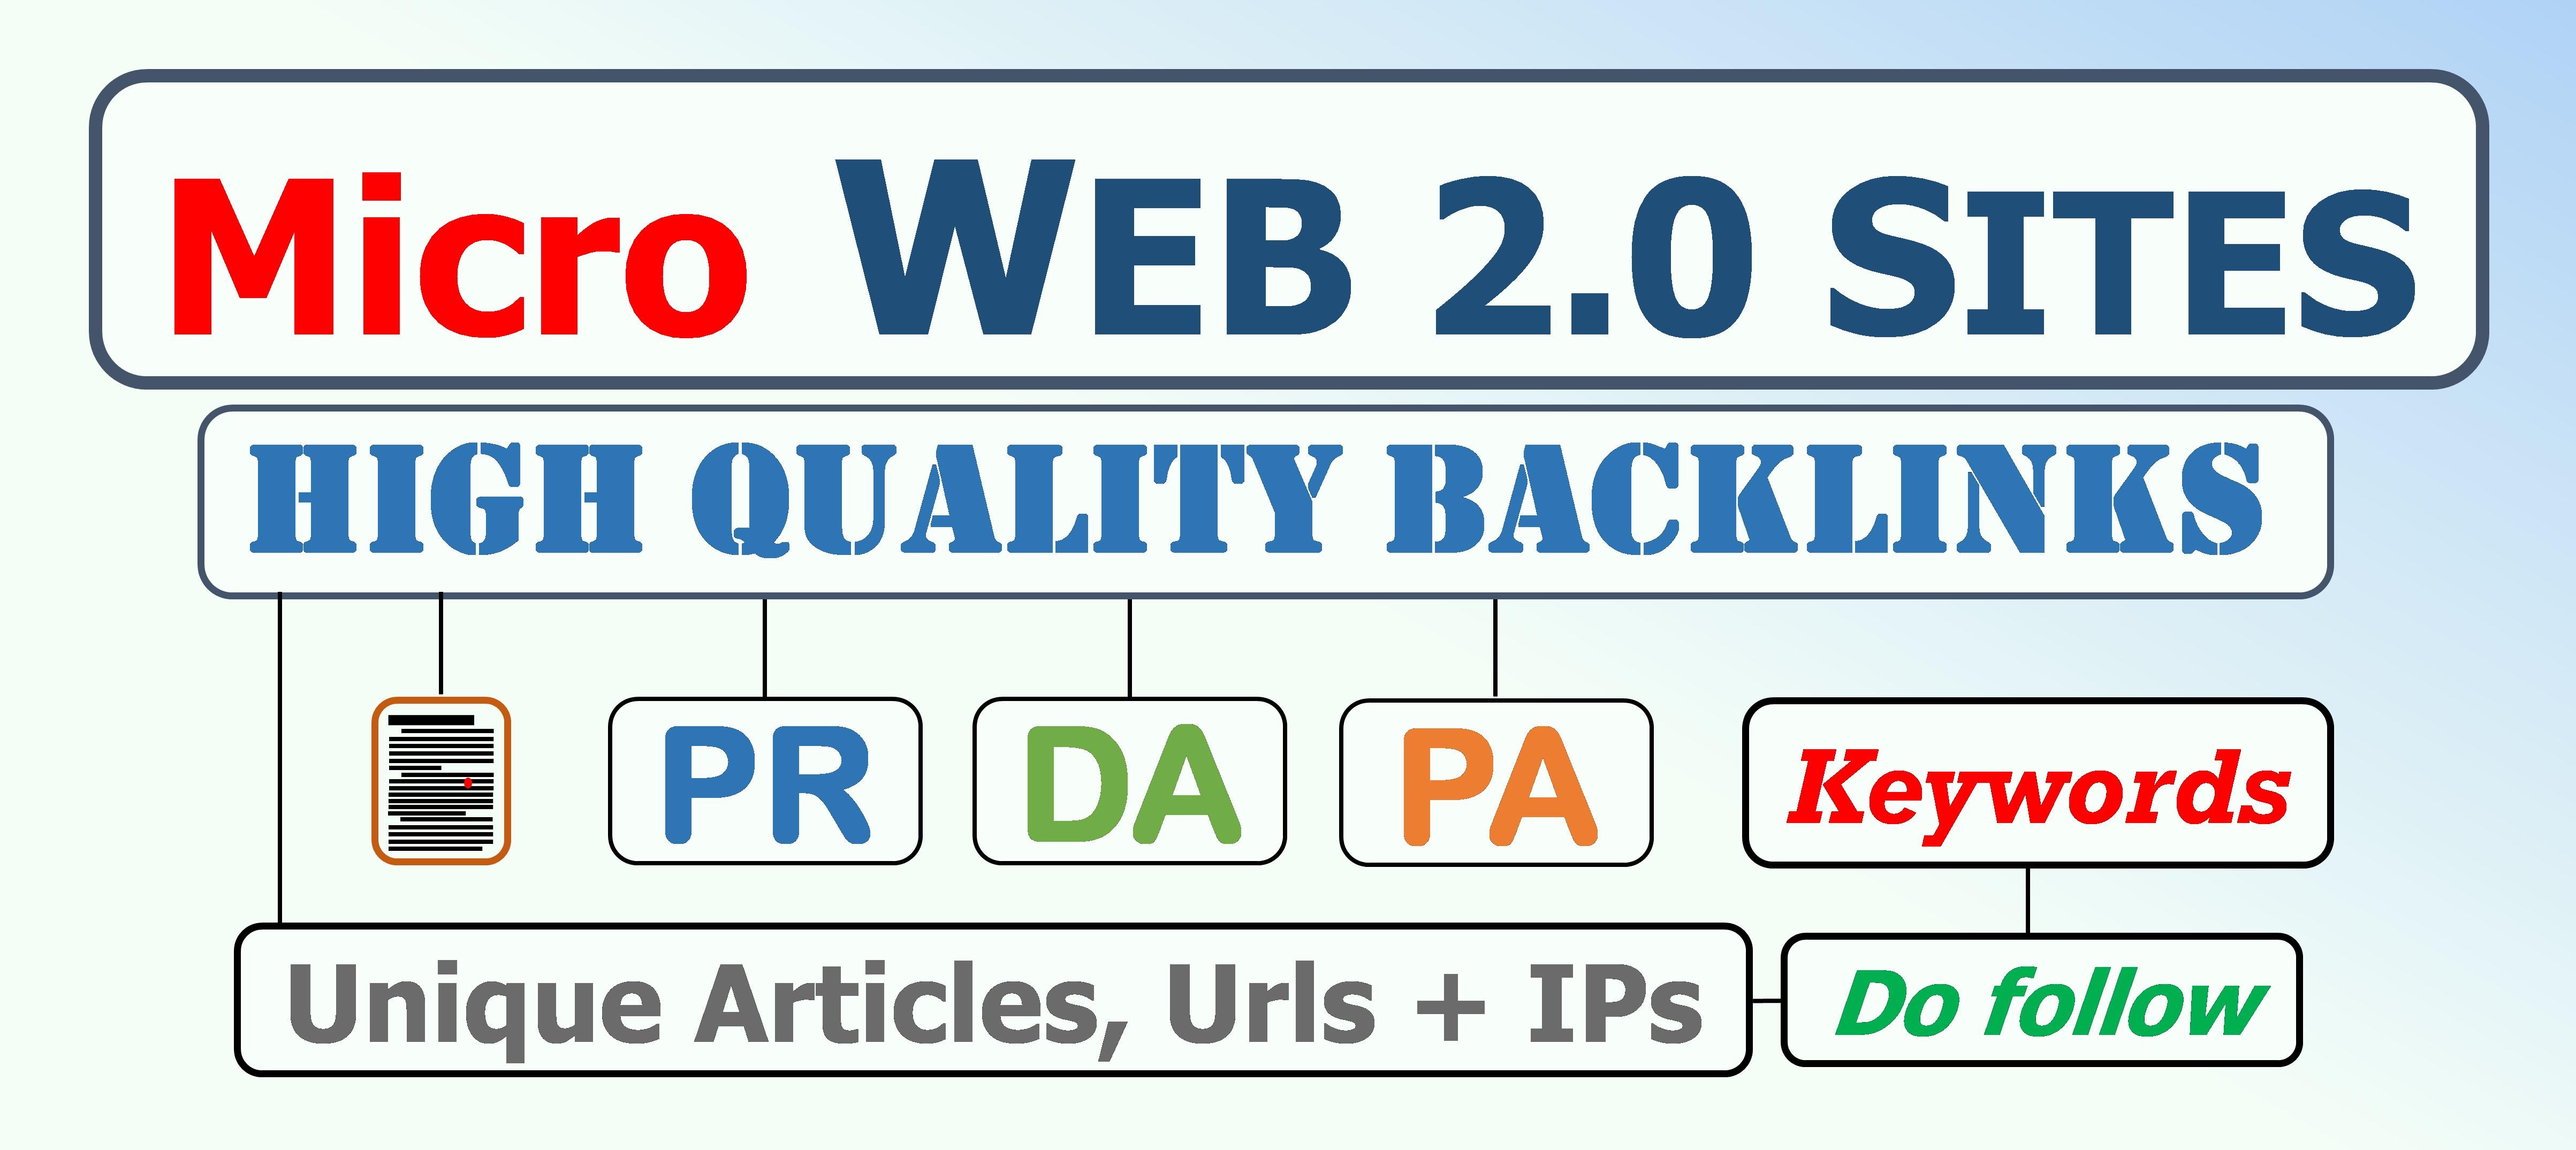 Micro Panda Safe 4.2 Backlinks with PR, DA, PA, do follow Web 2.0 Blogs for Organic traffic